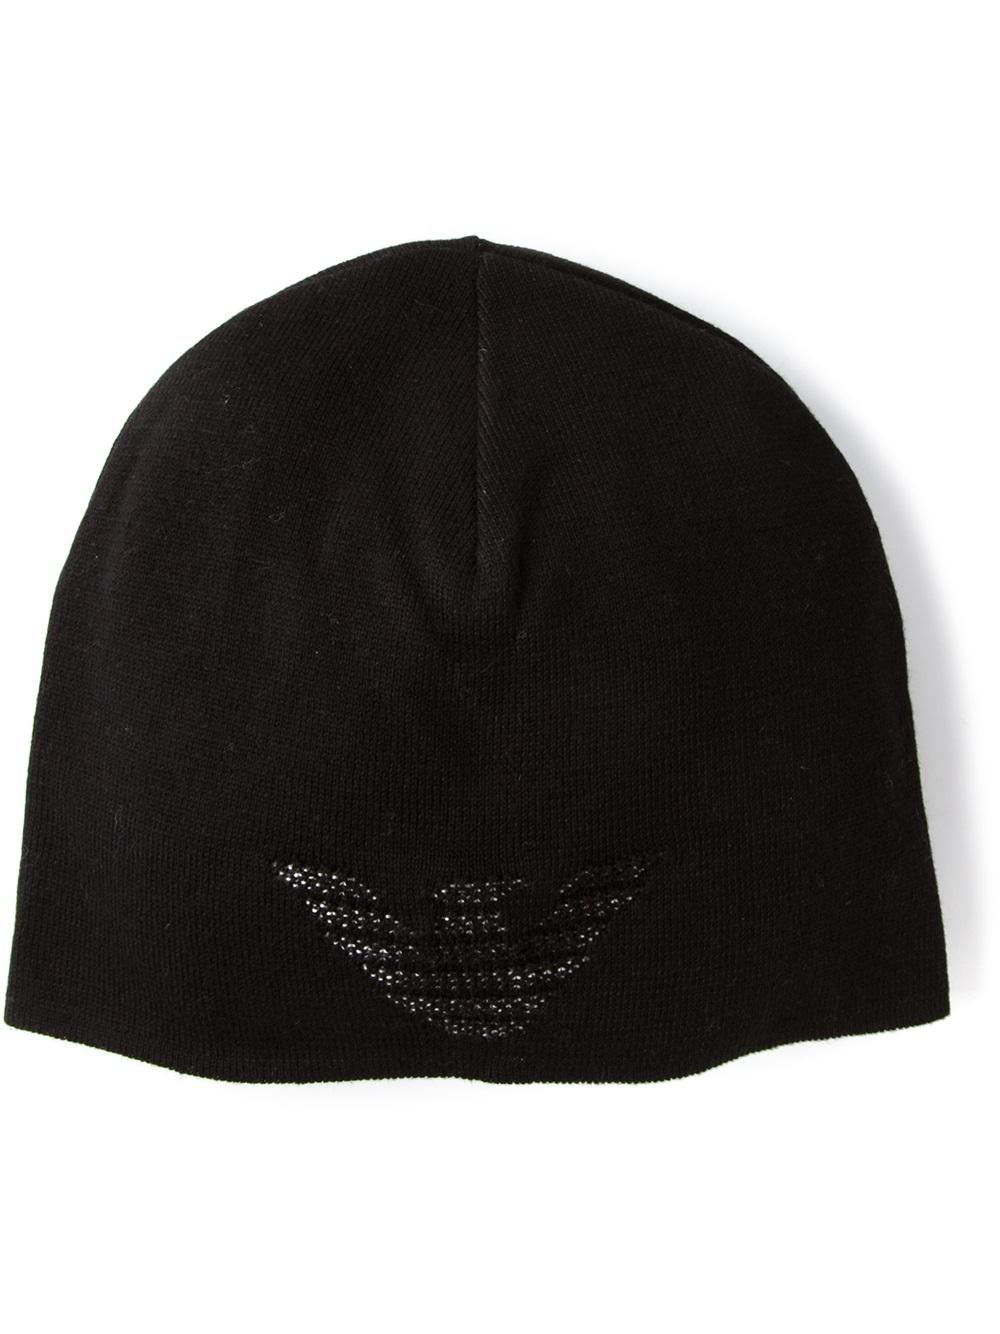 Lyst - Emporio Armani Beanie in Black for Men 288b8a142f8